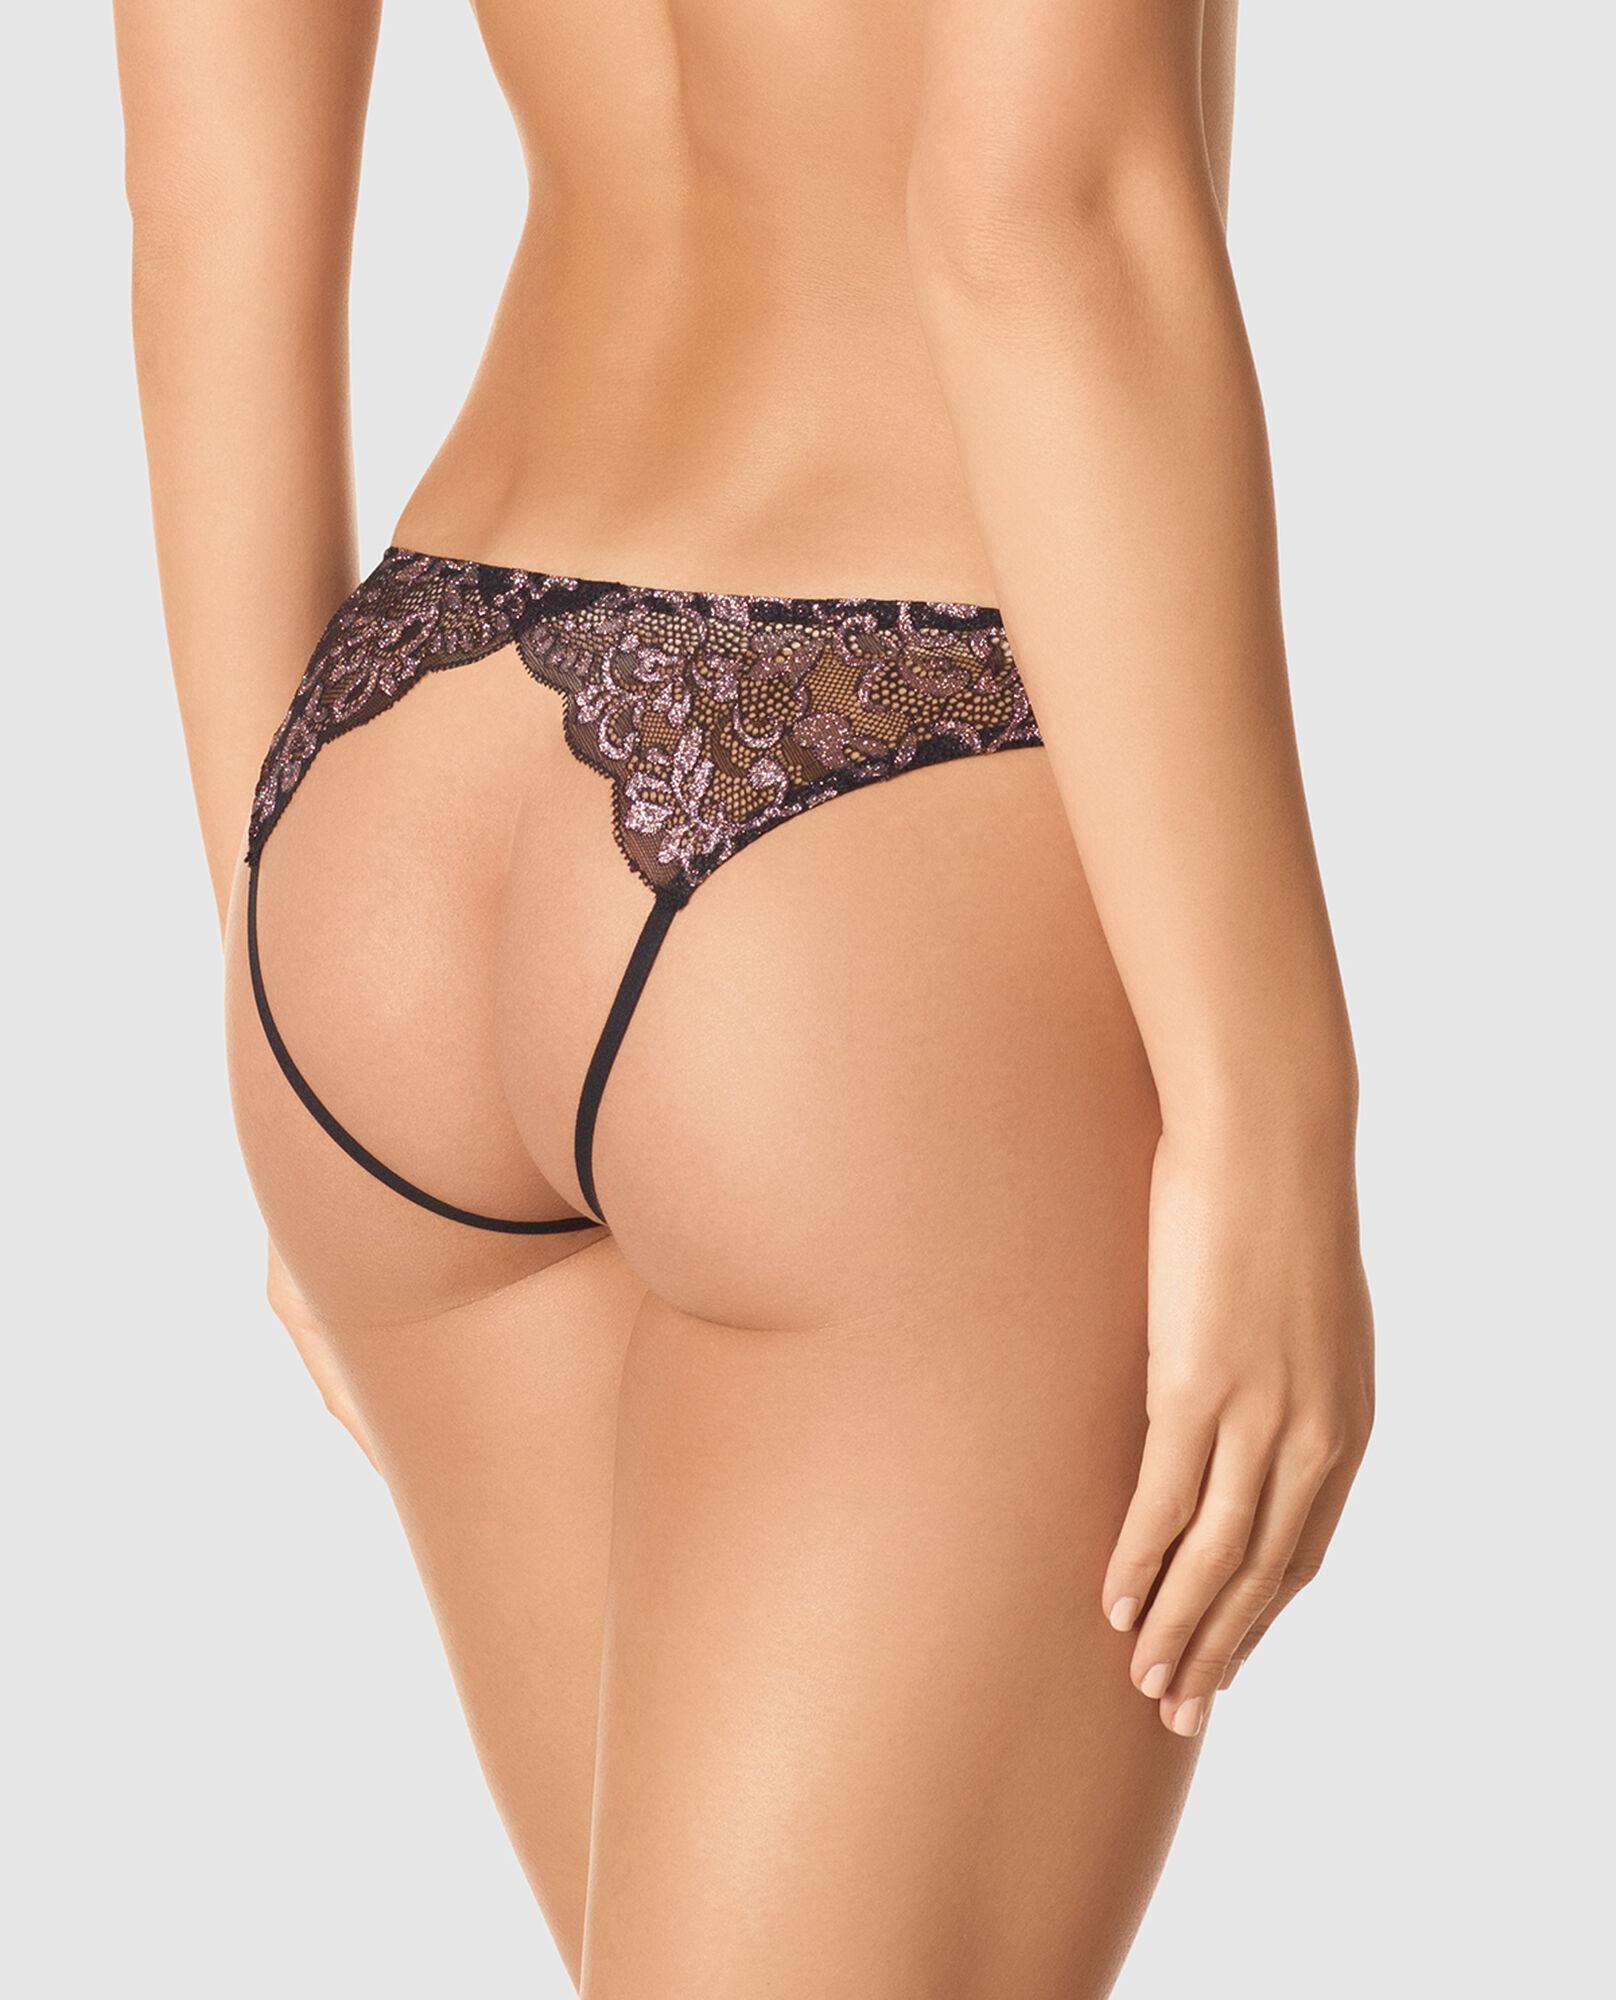 d7fd92813522f Bumless Crotchless Panty | La Senza